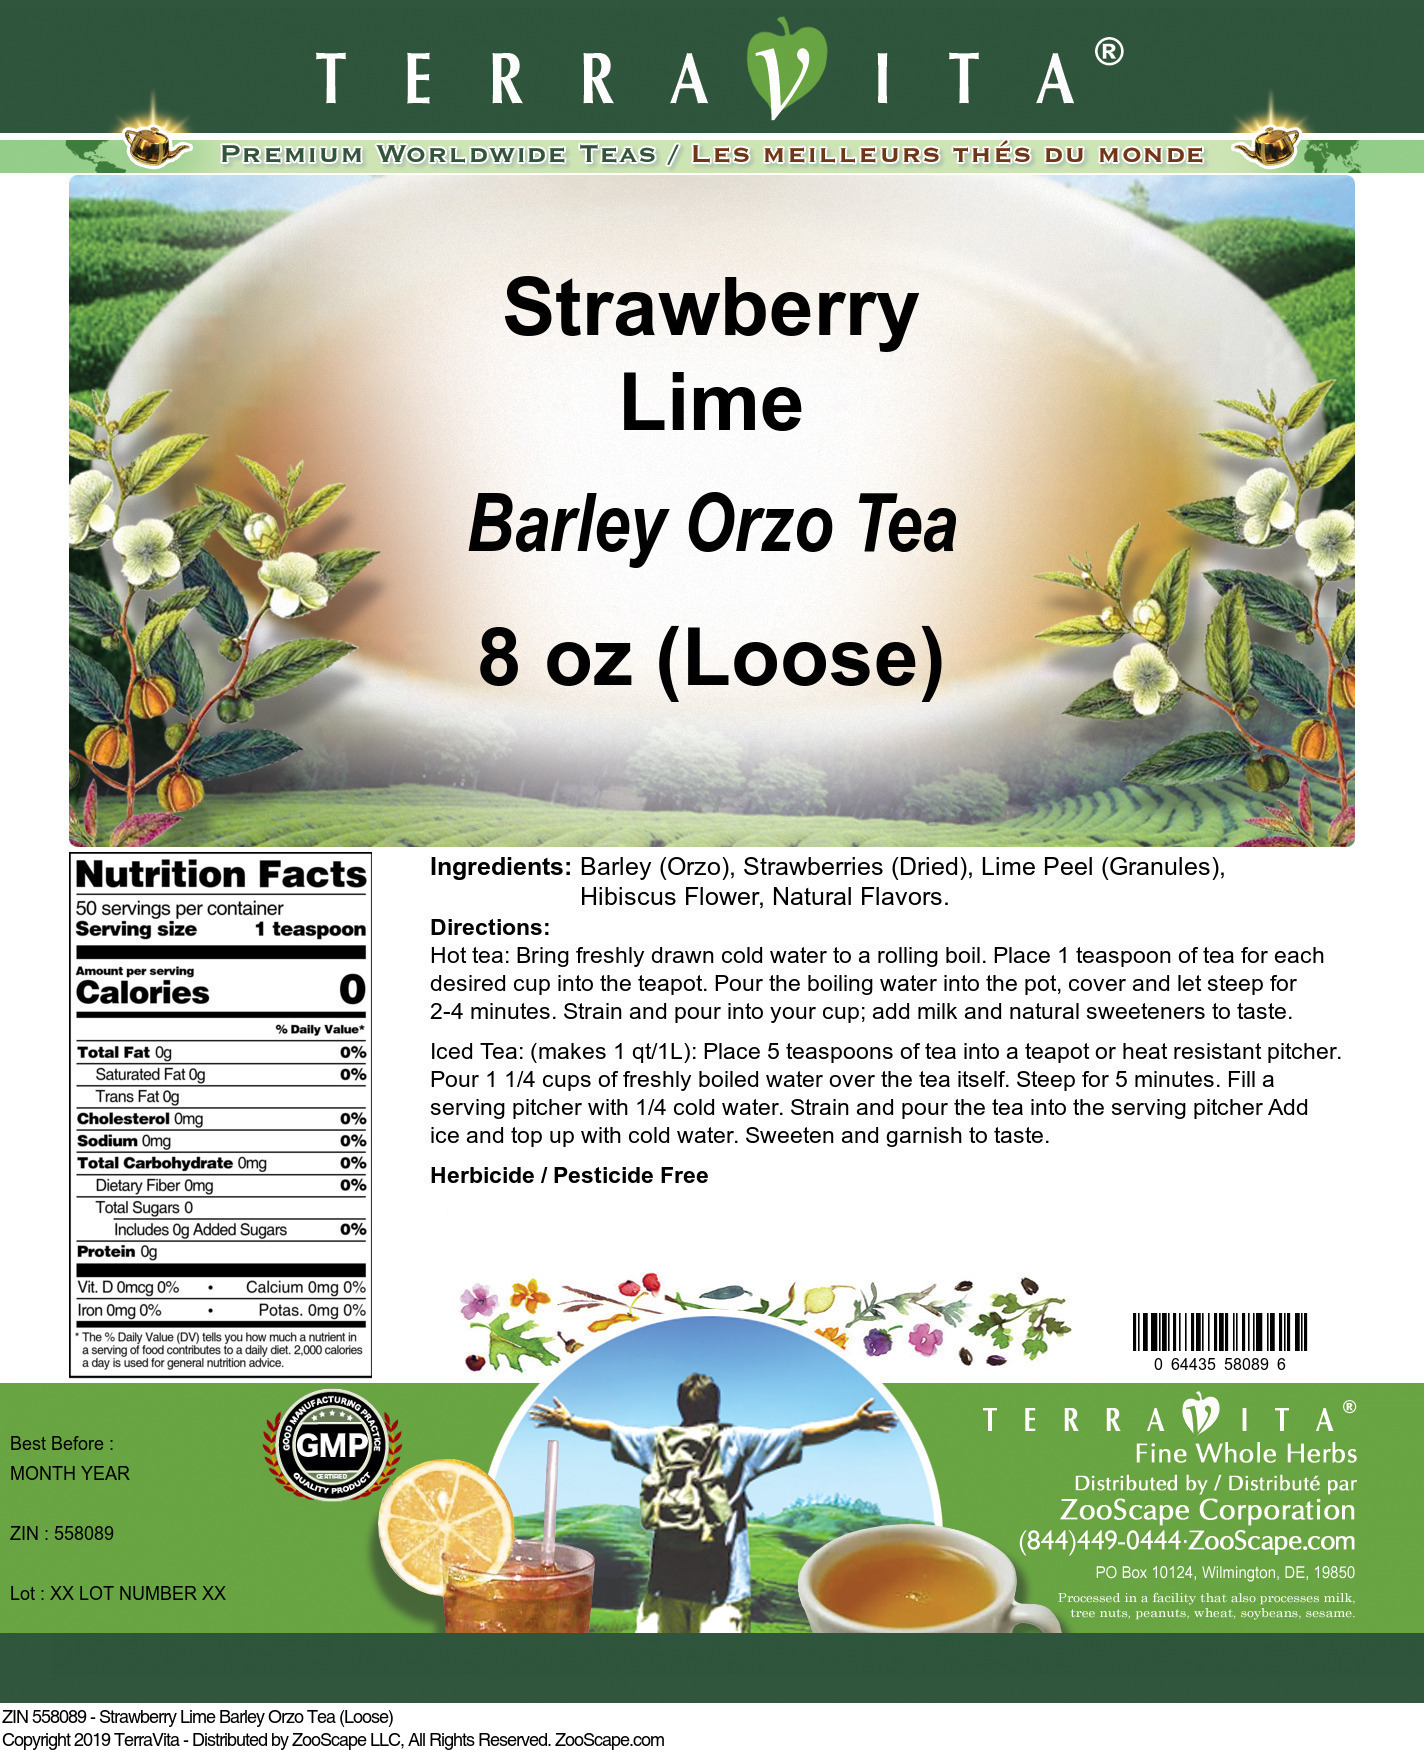 Strawberry Lime Barley Orzo